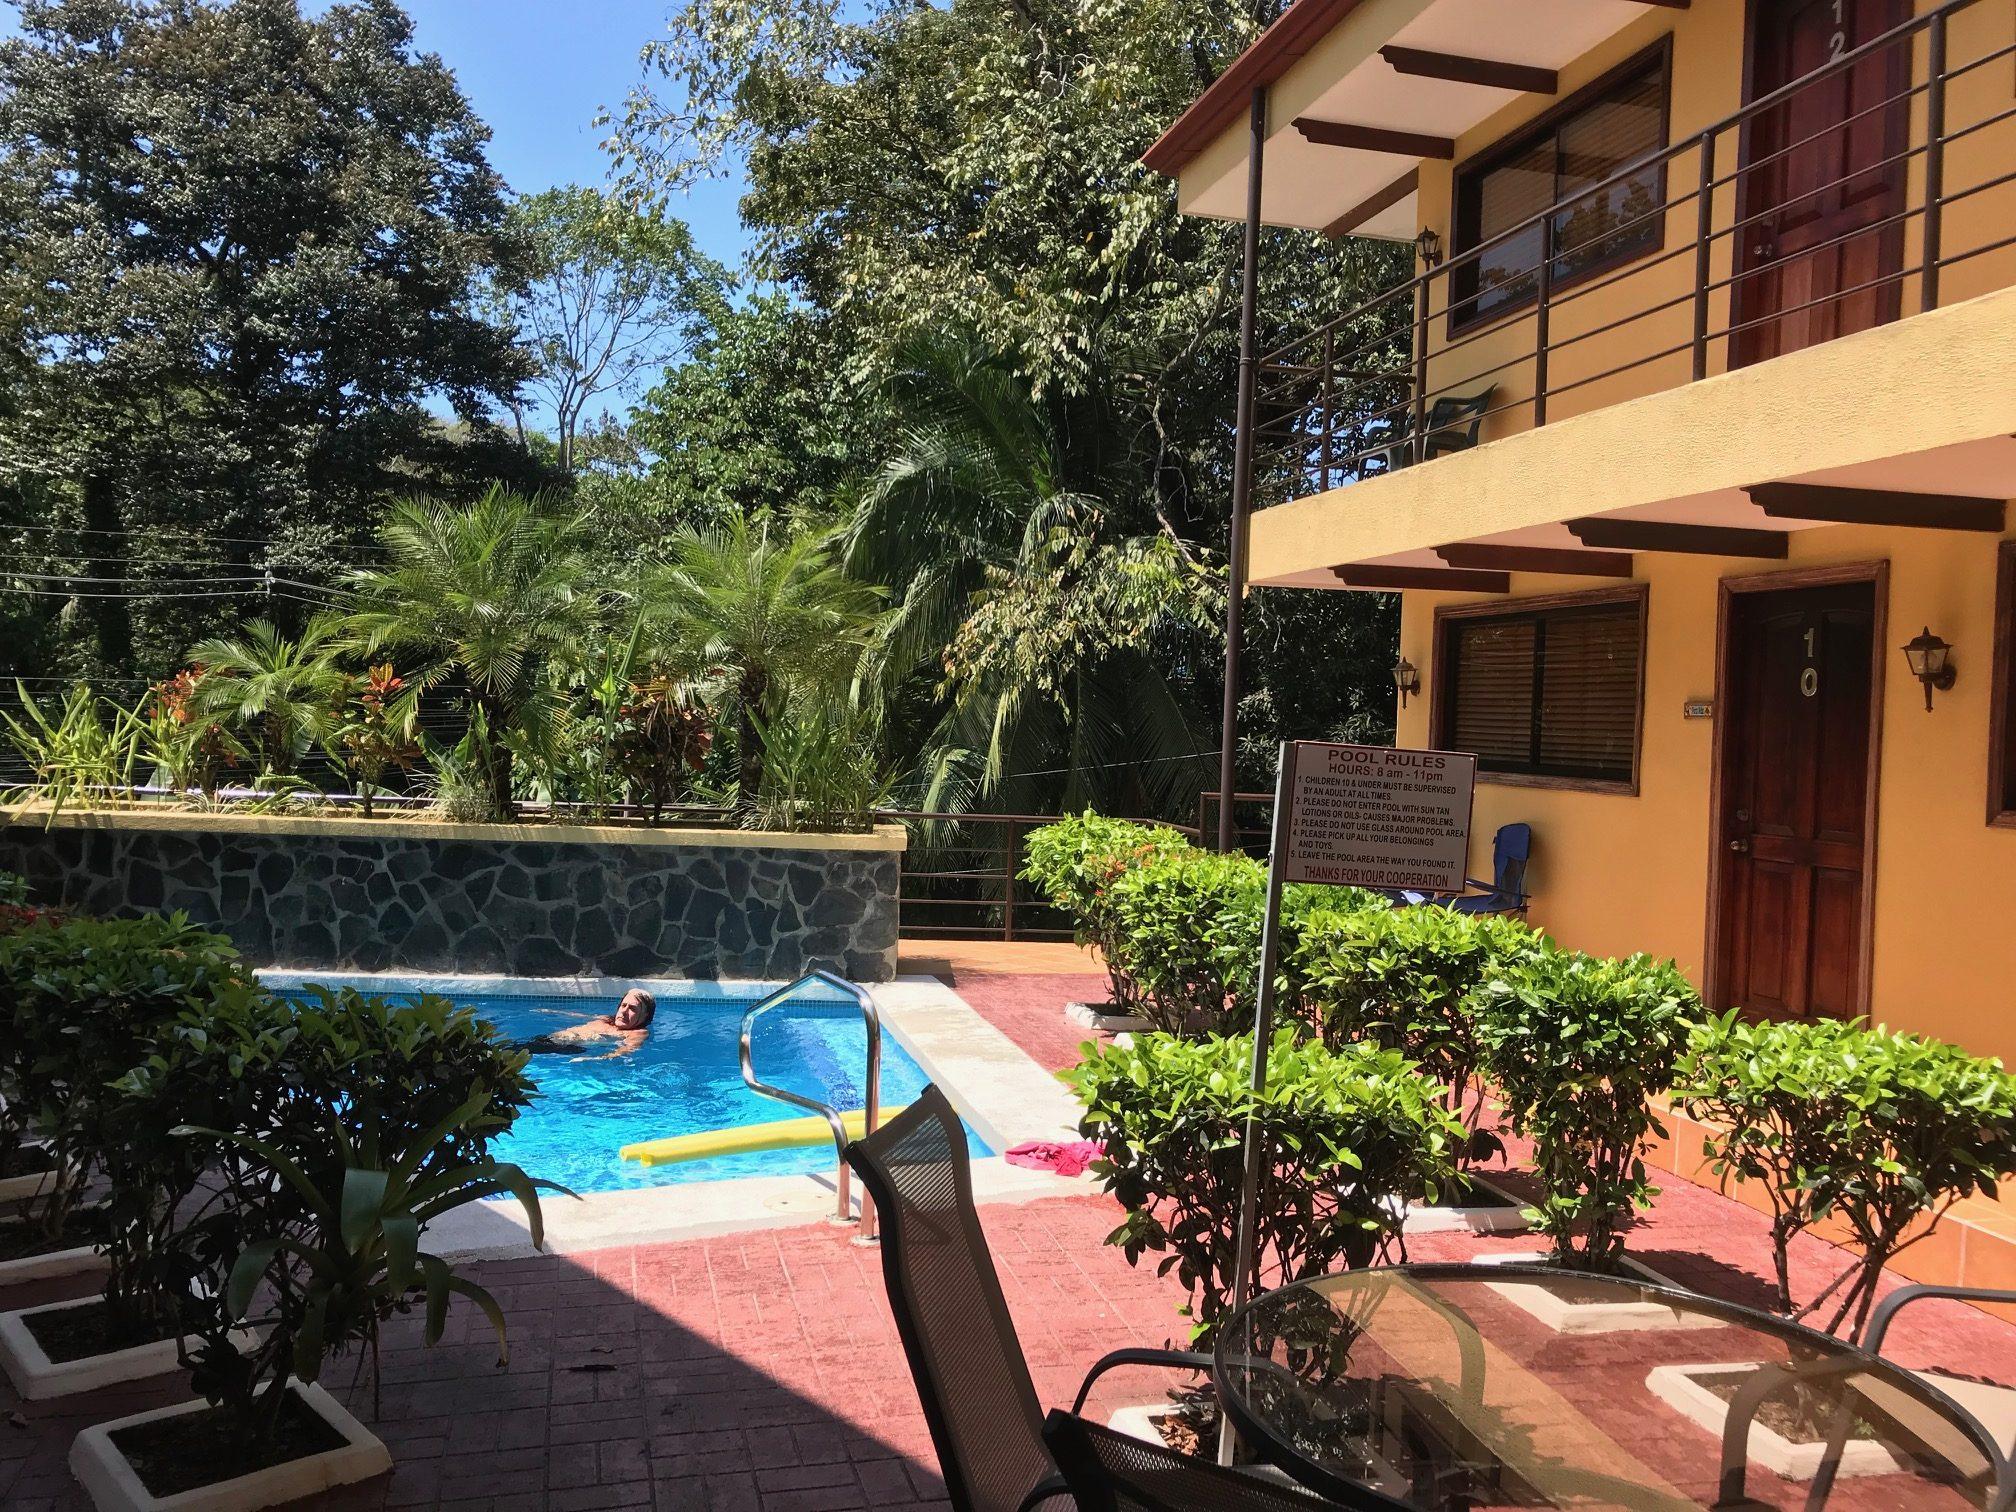 CONDO – 2 Bedroom Condos 5 Min From Beach With Pool!!